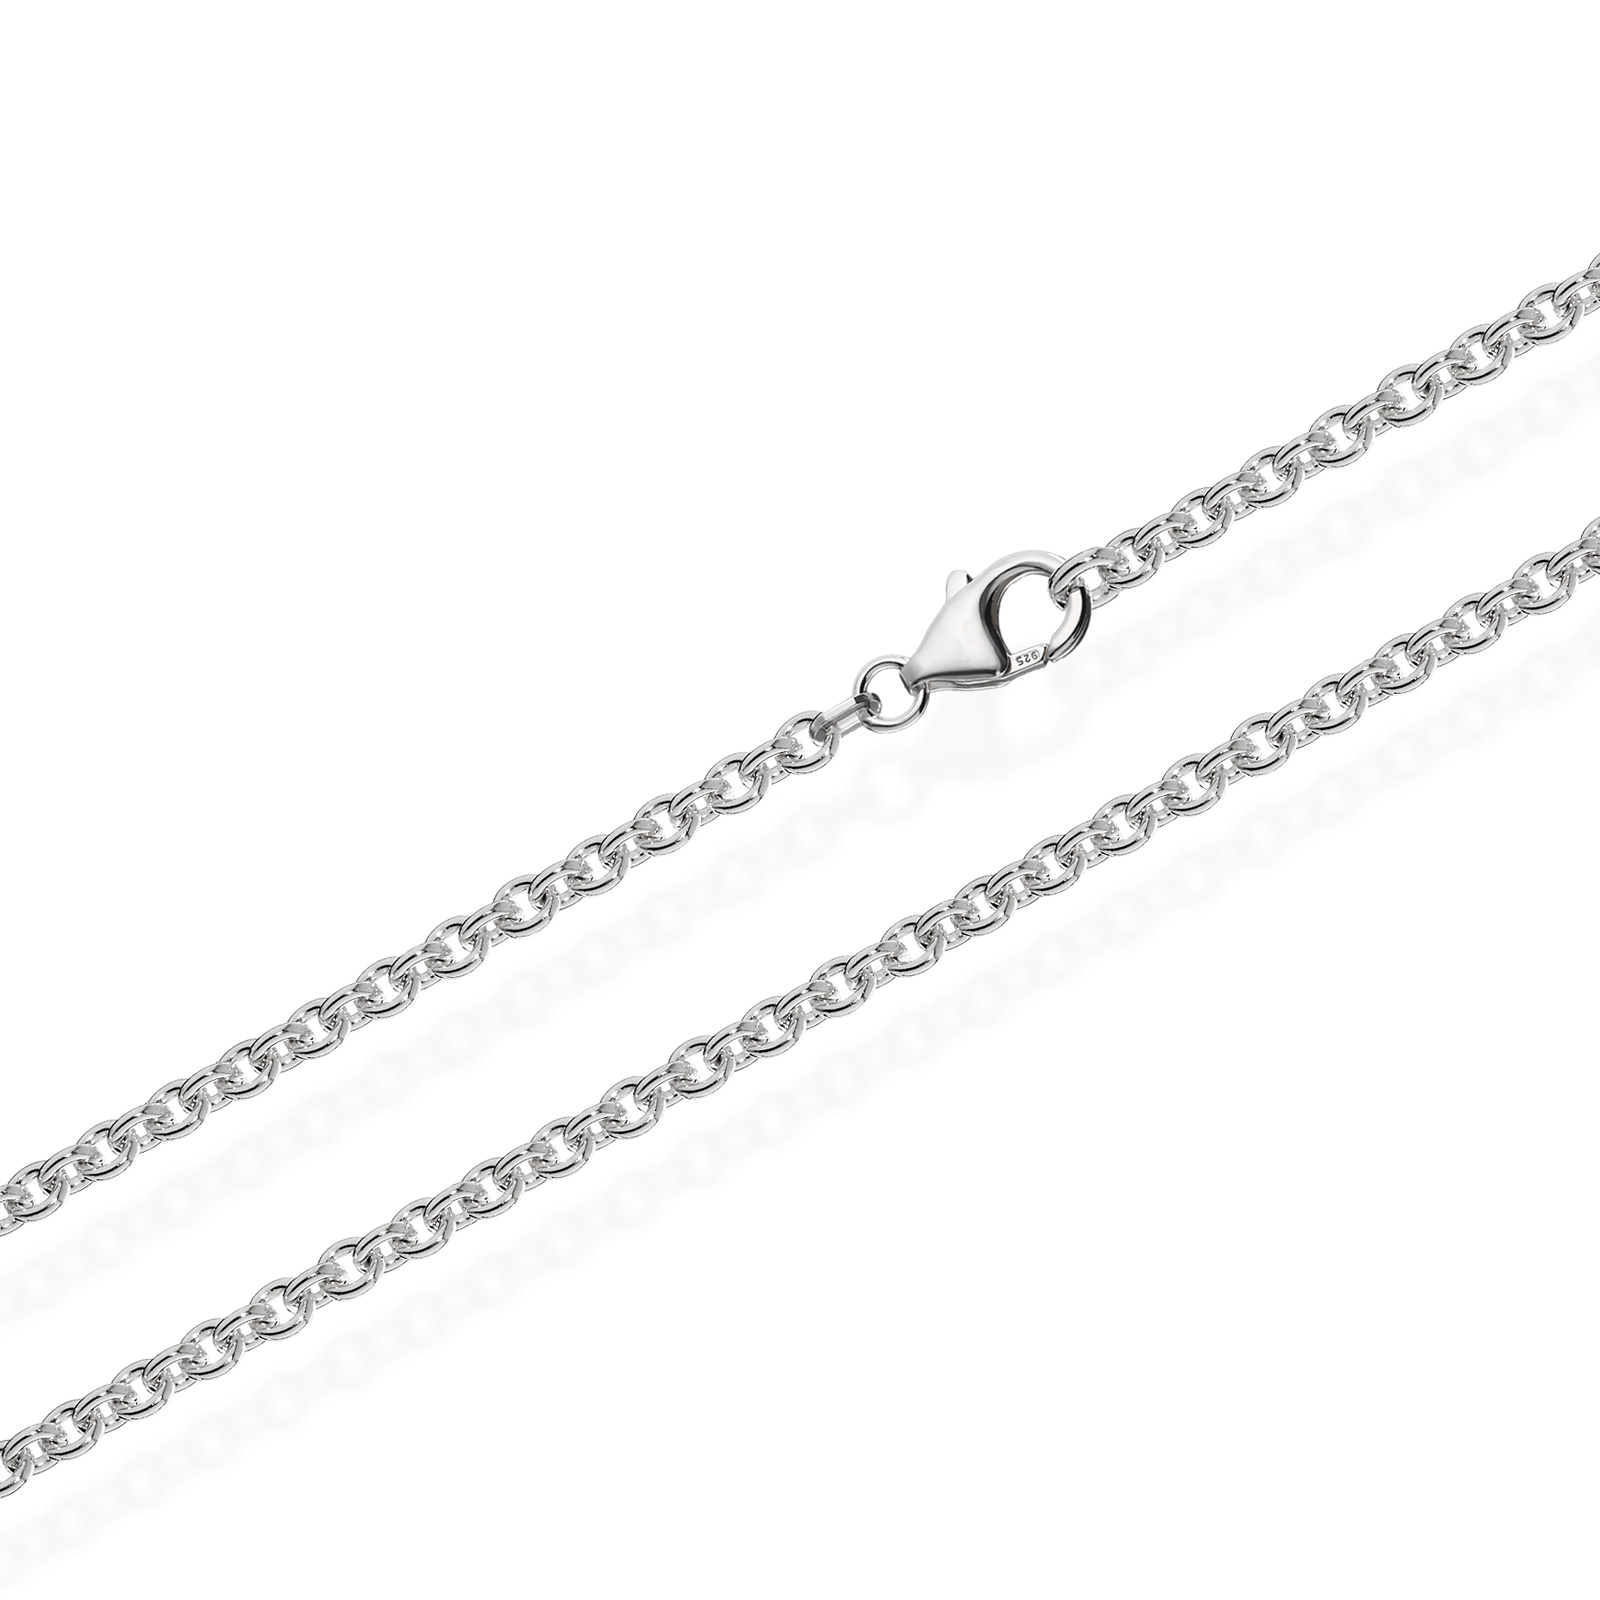 ANKERKETTE 925 Sterling Silber Kette Rund MASSIV Collier 2,80mm Damen Herren